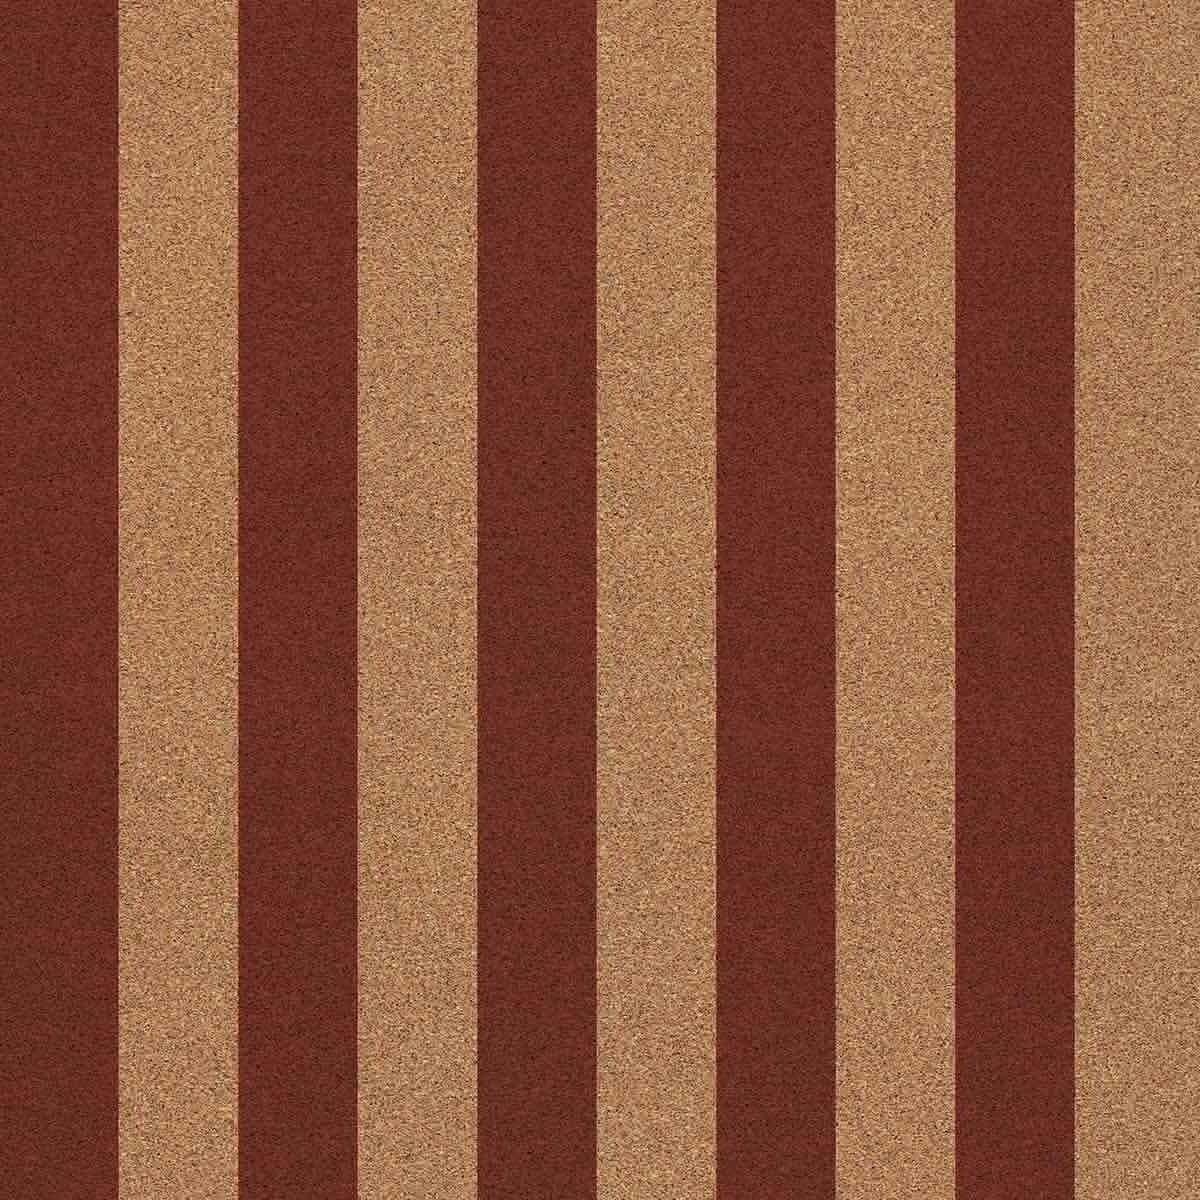 Decorative cork thin paper Straight Marine Meca Orange Cork